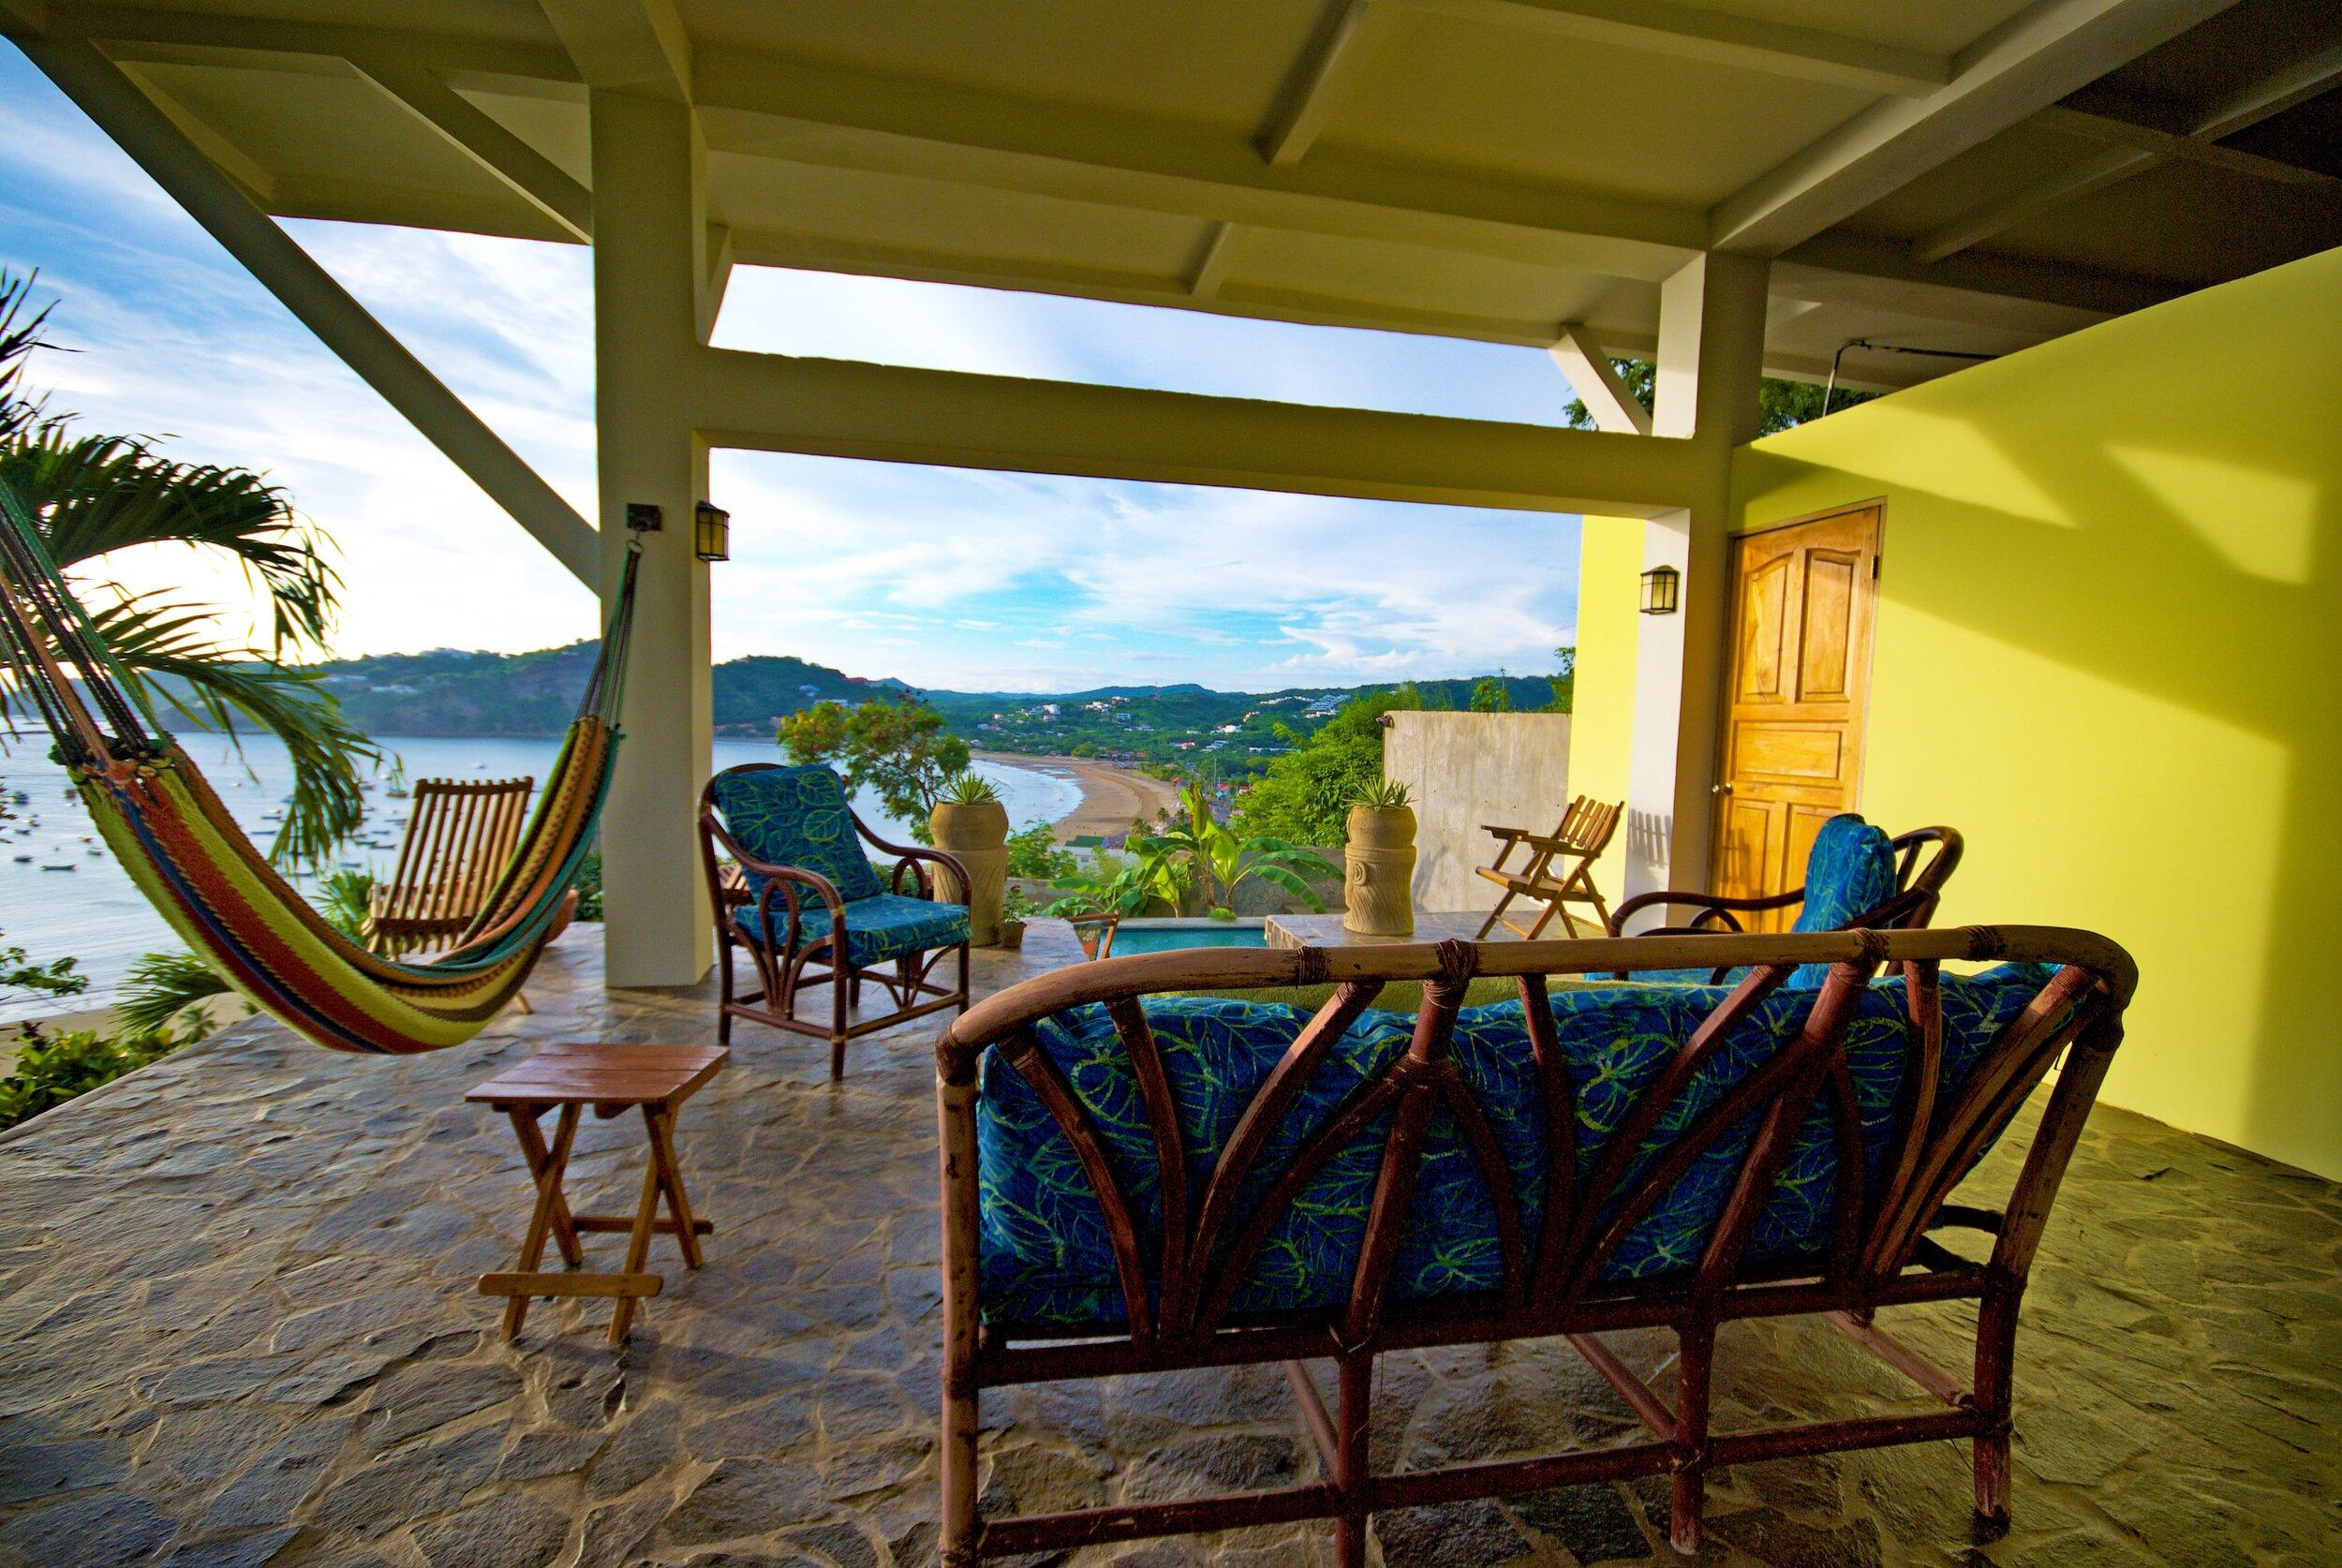 Ocean View Home For Sale San Juan Del Sur 12.jpg